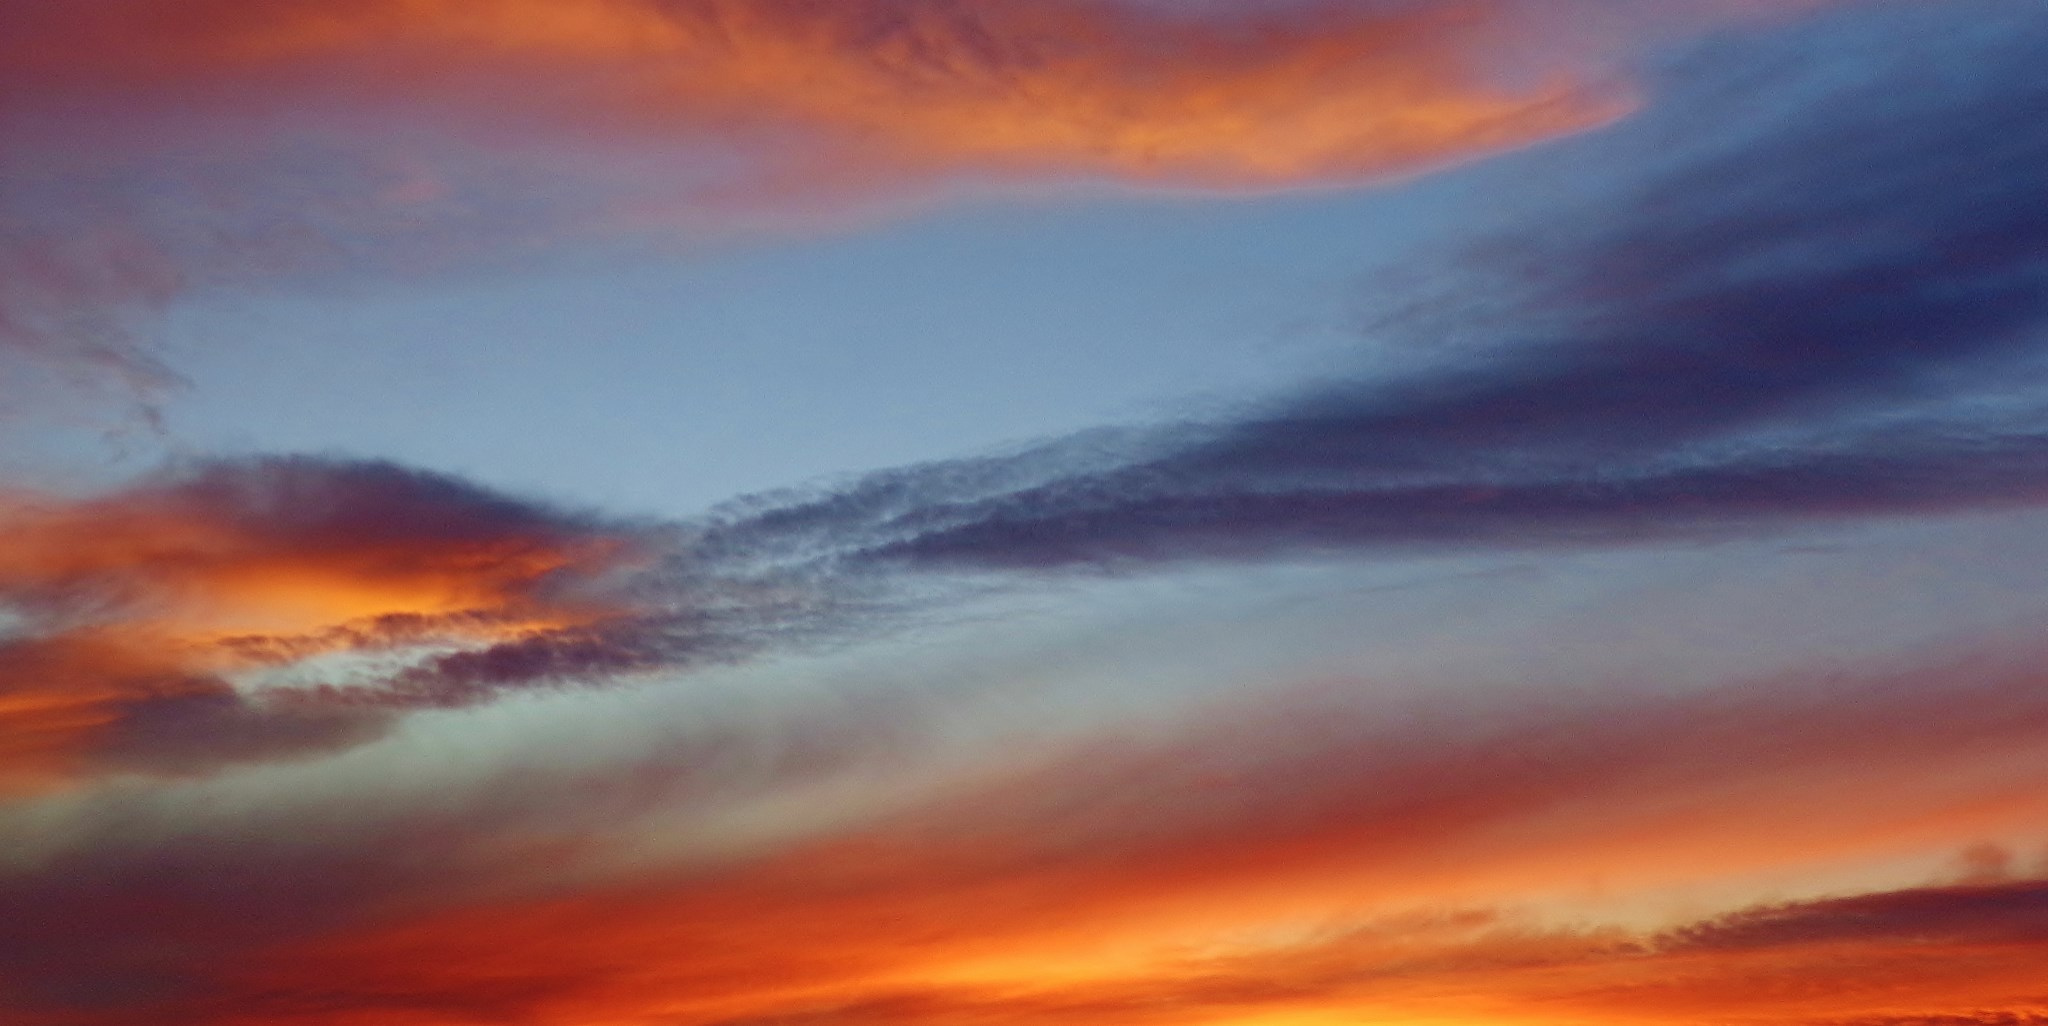 Florida Fall Sunset © Olin Gilbert/flickr